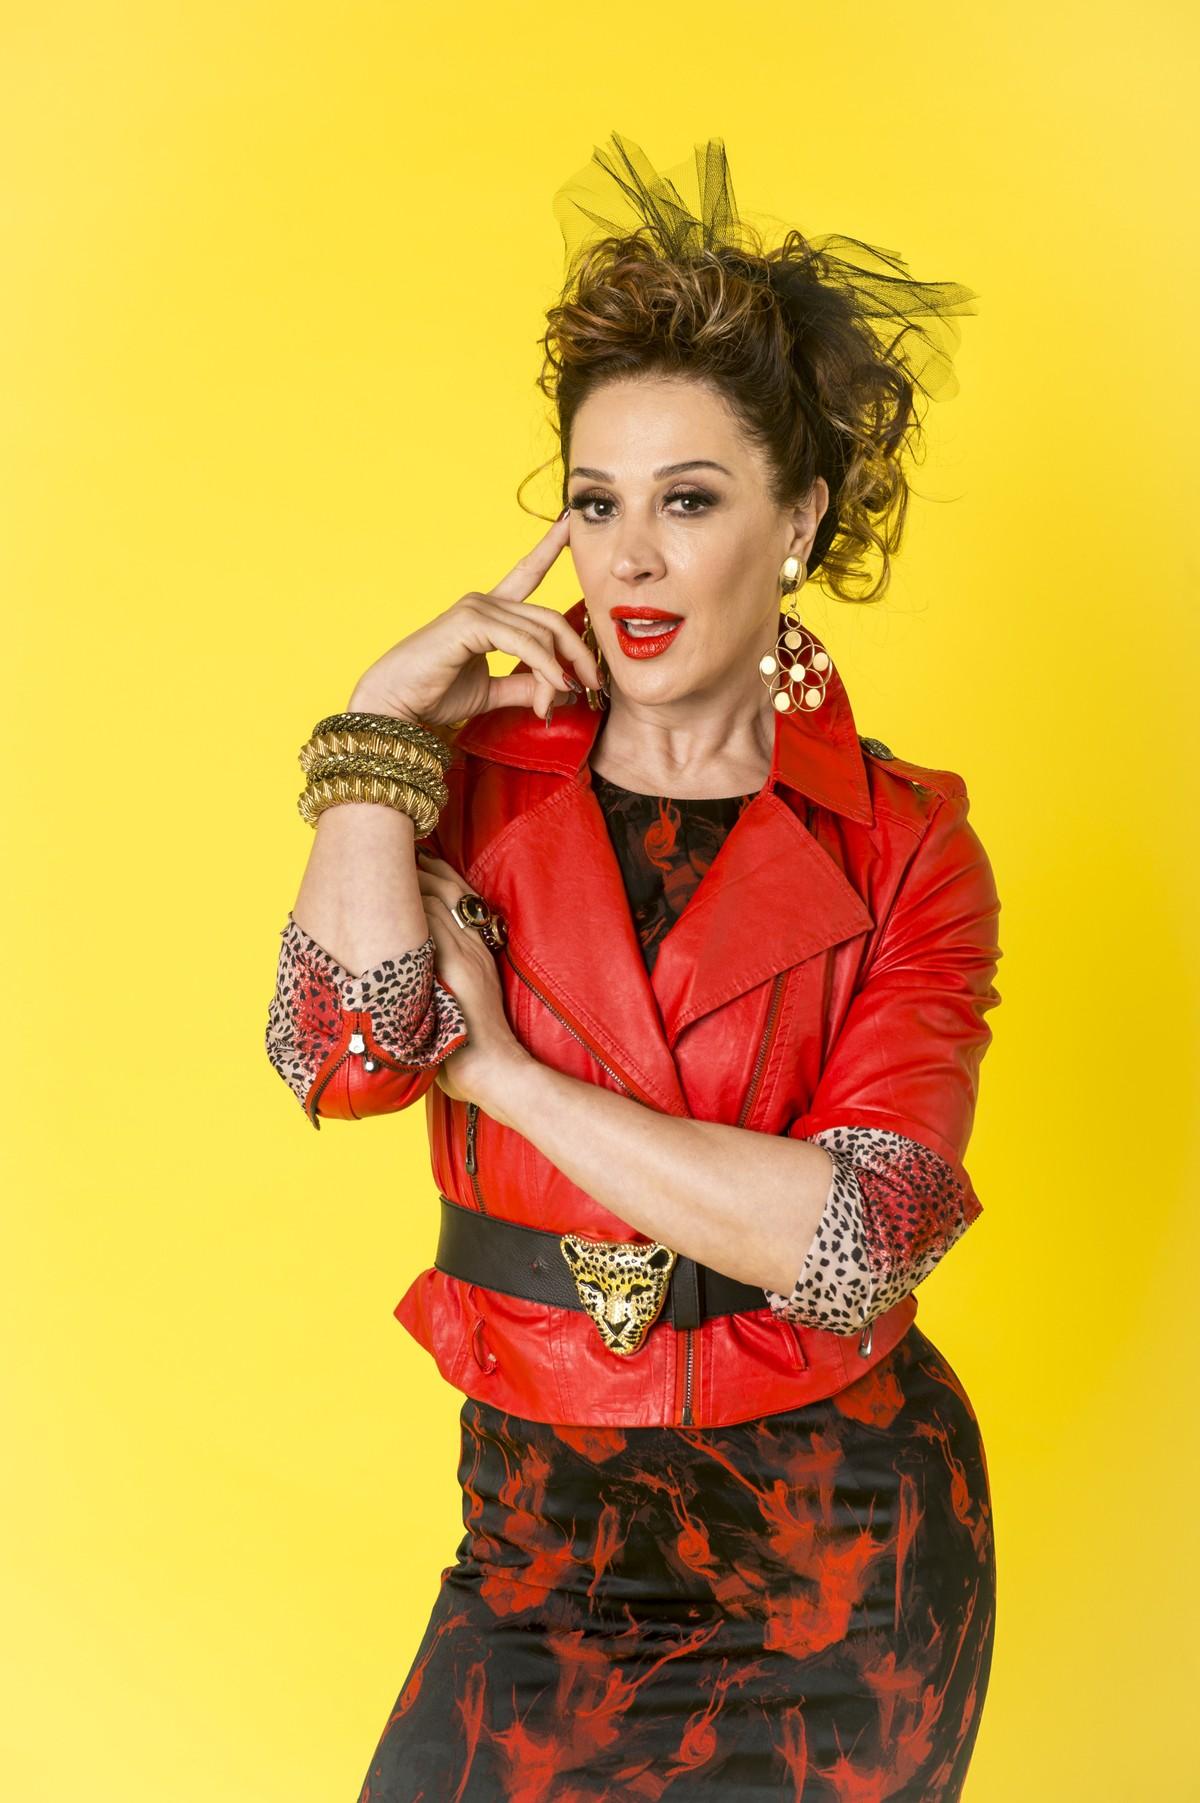 Claudia Raia Lidiane Verao 90 Credito Globo Joao Cotta Flash Interview - Claudia Raia - &Quot;Verão 90&Quot;